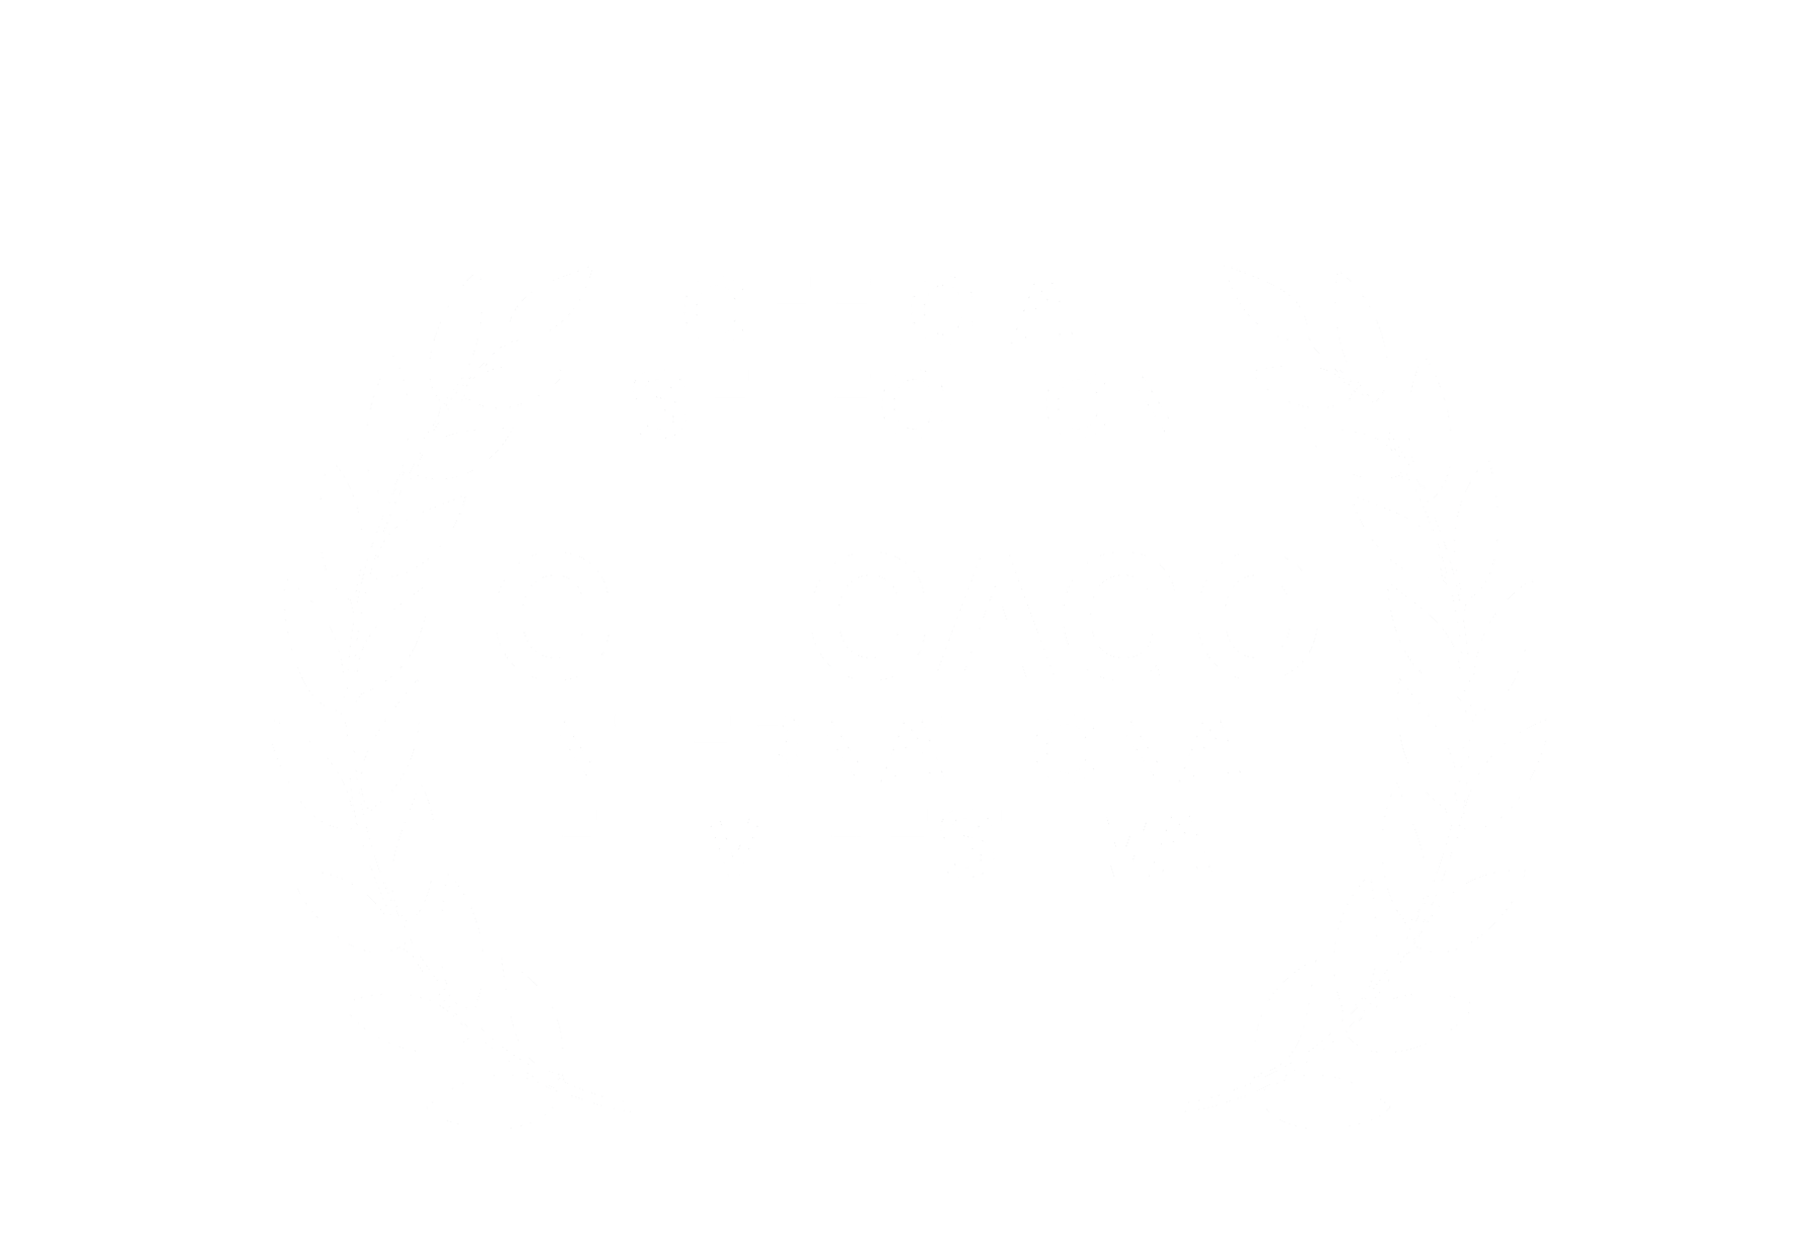 chicago_award.png